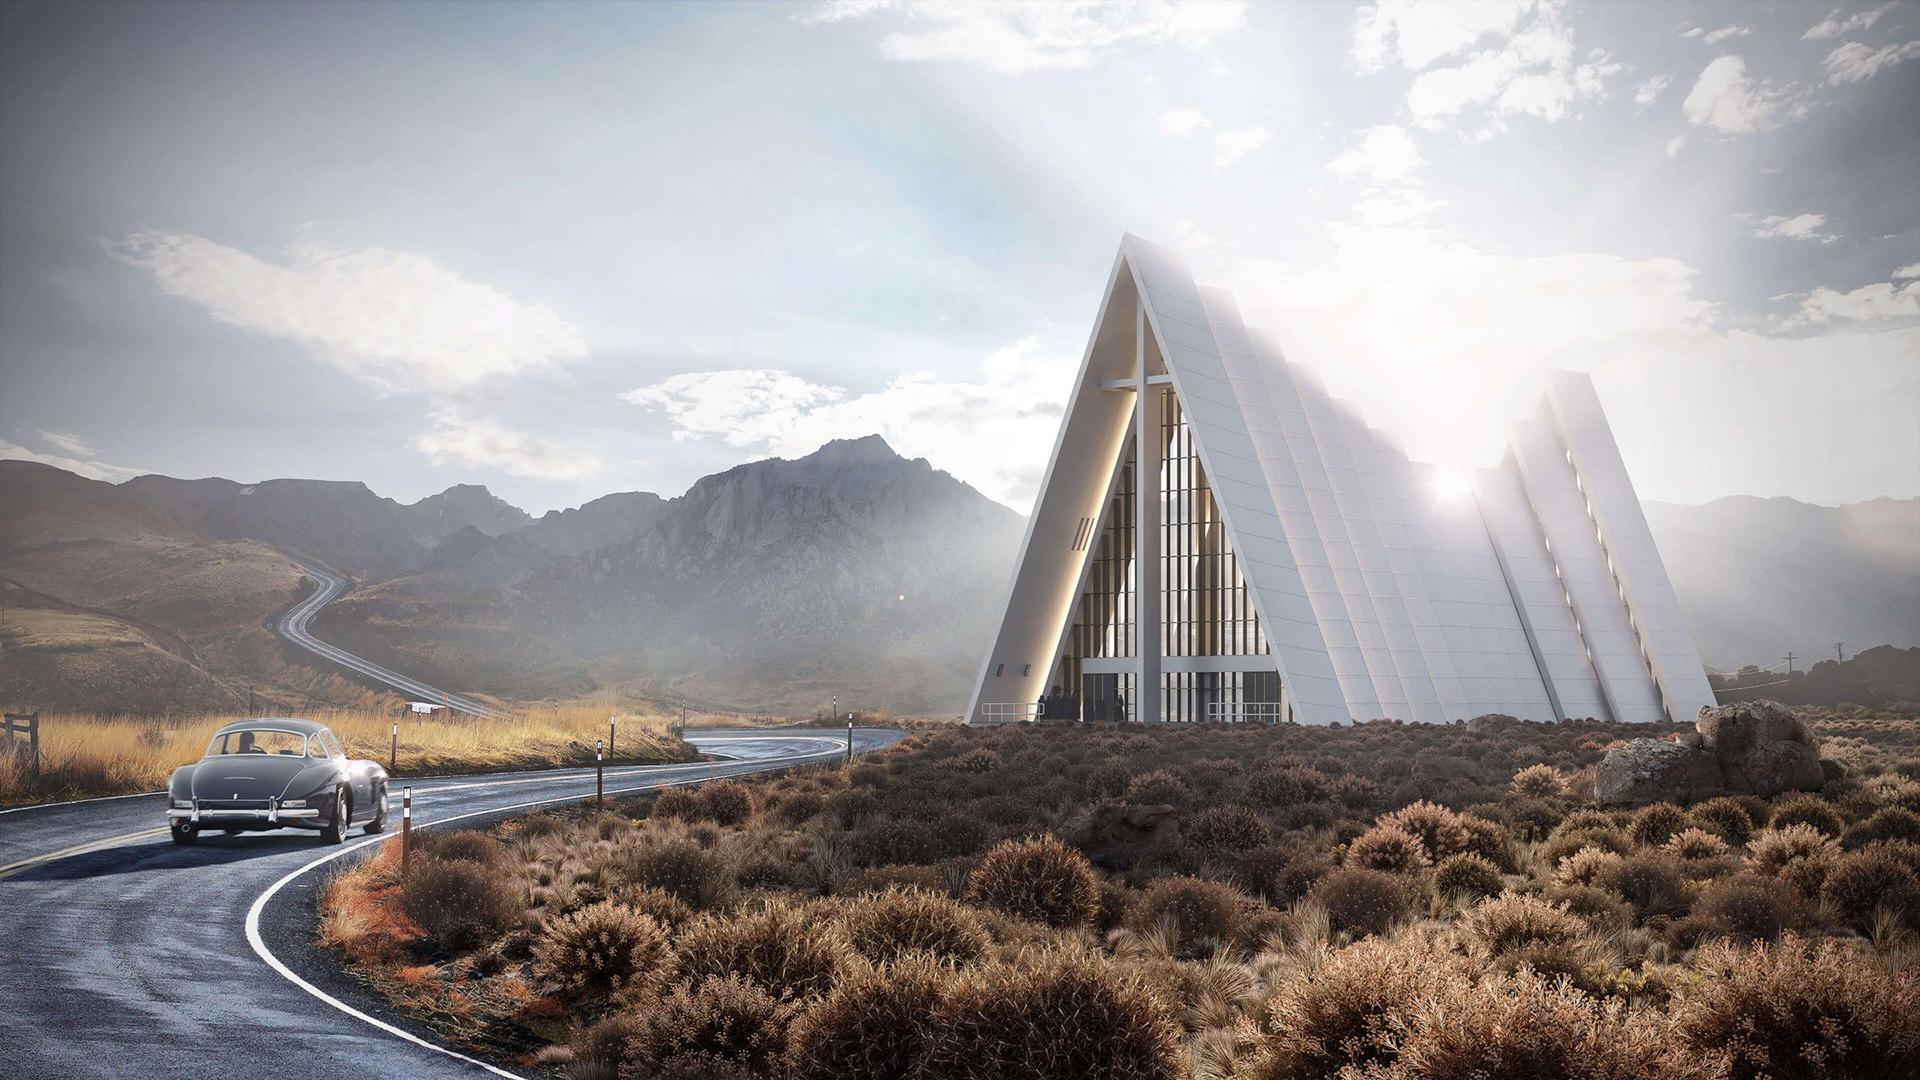 3D Exterior Rendering of a Church Design